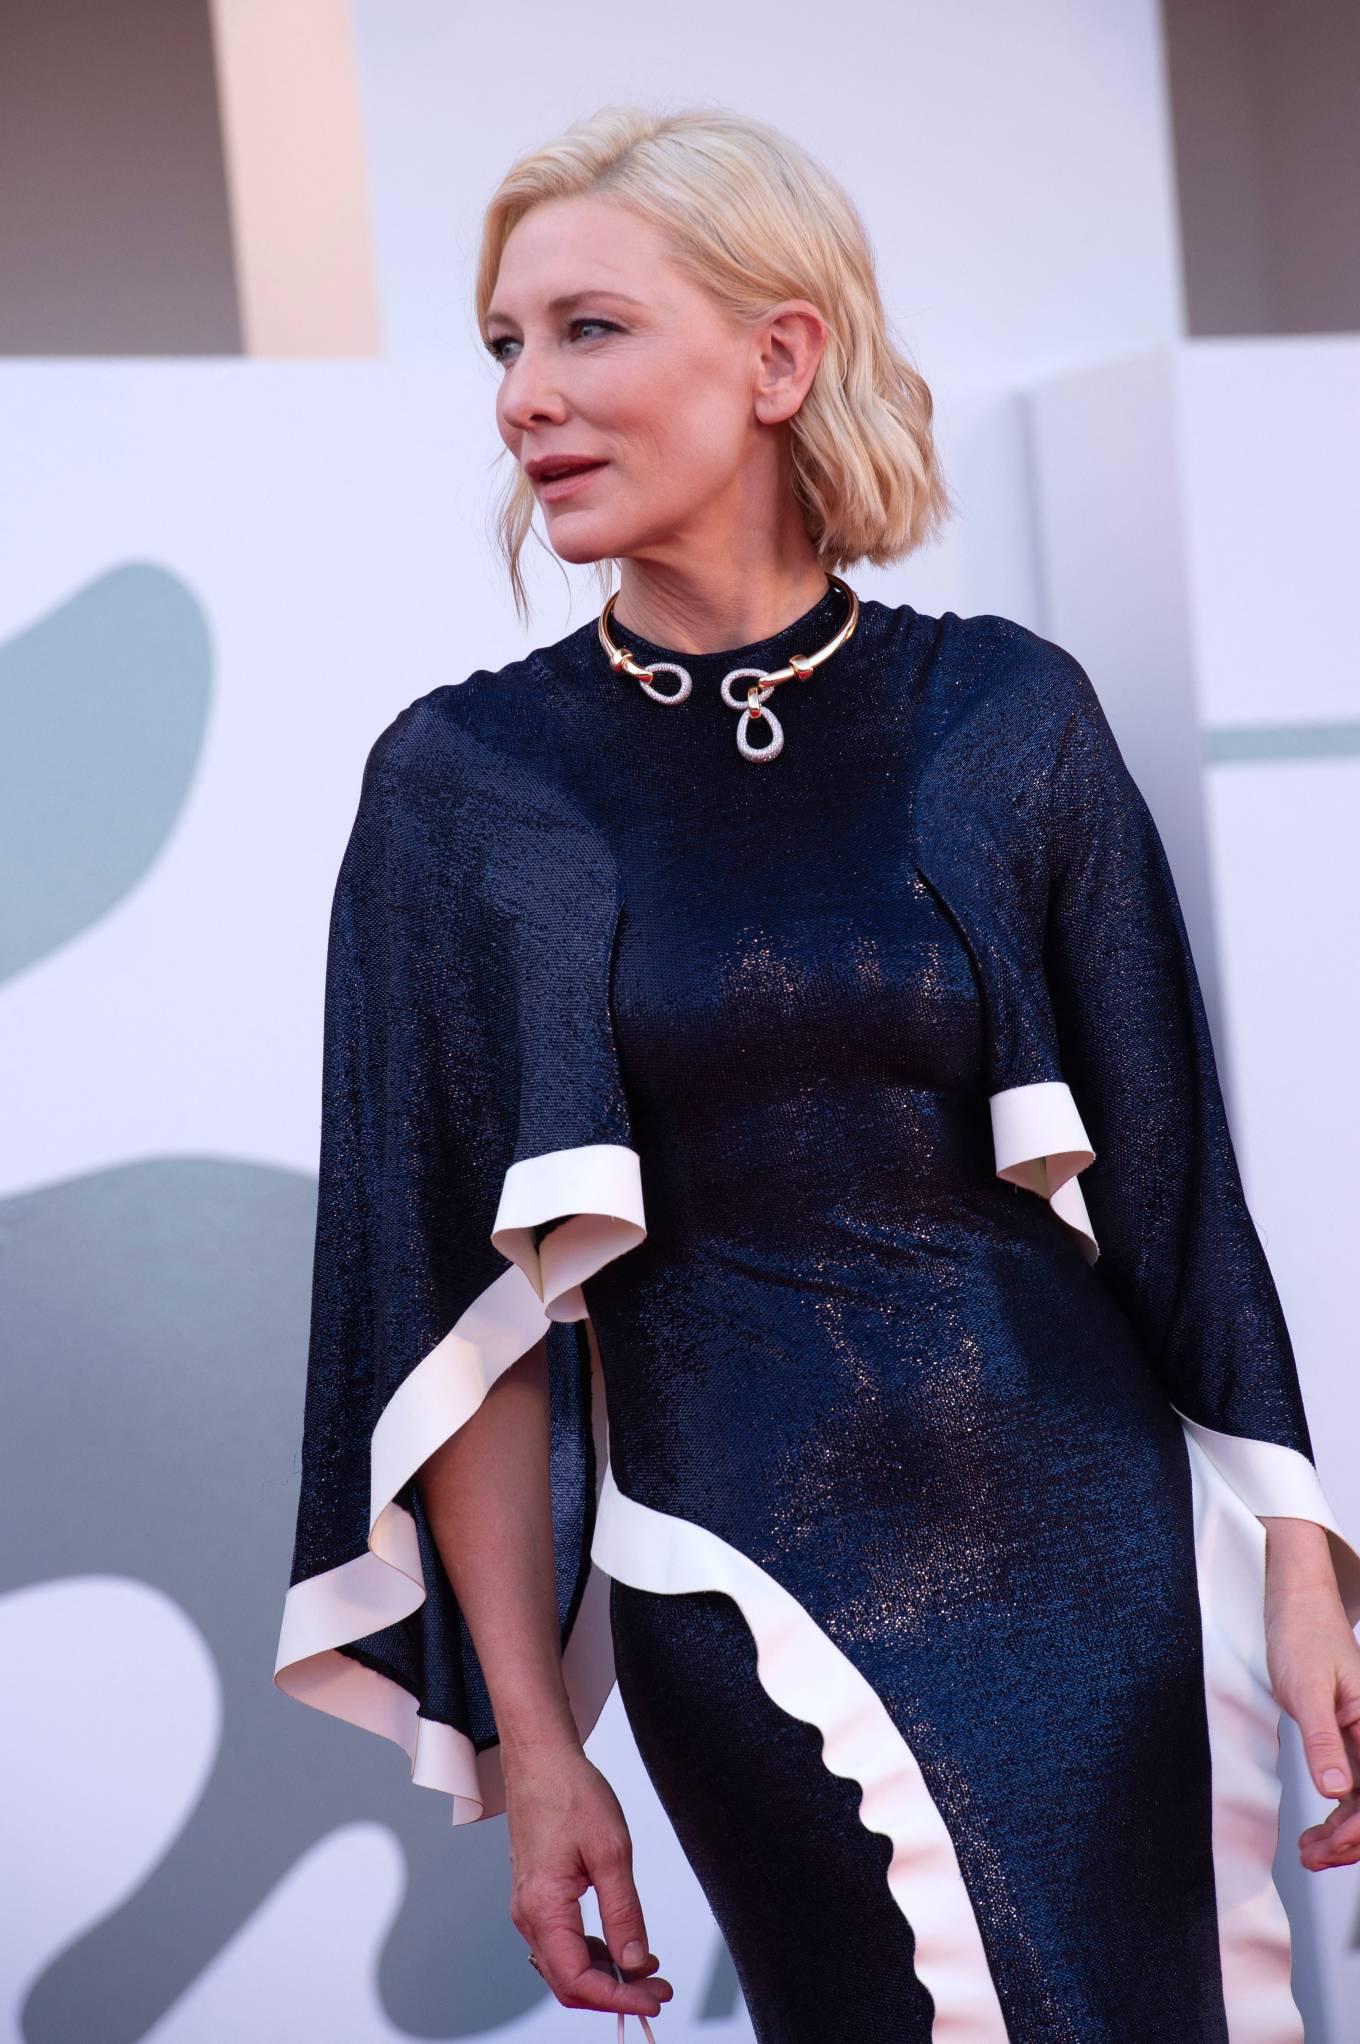 Cate Blanchett 2020 : Cate Blanchett attending Opening Ceremony at 2020 Venice International Film Festival – Italy-07